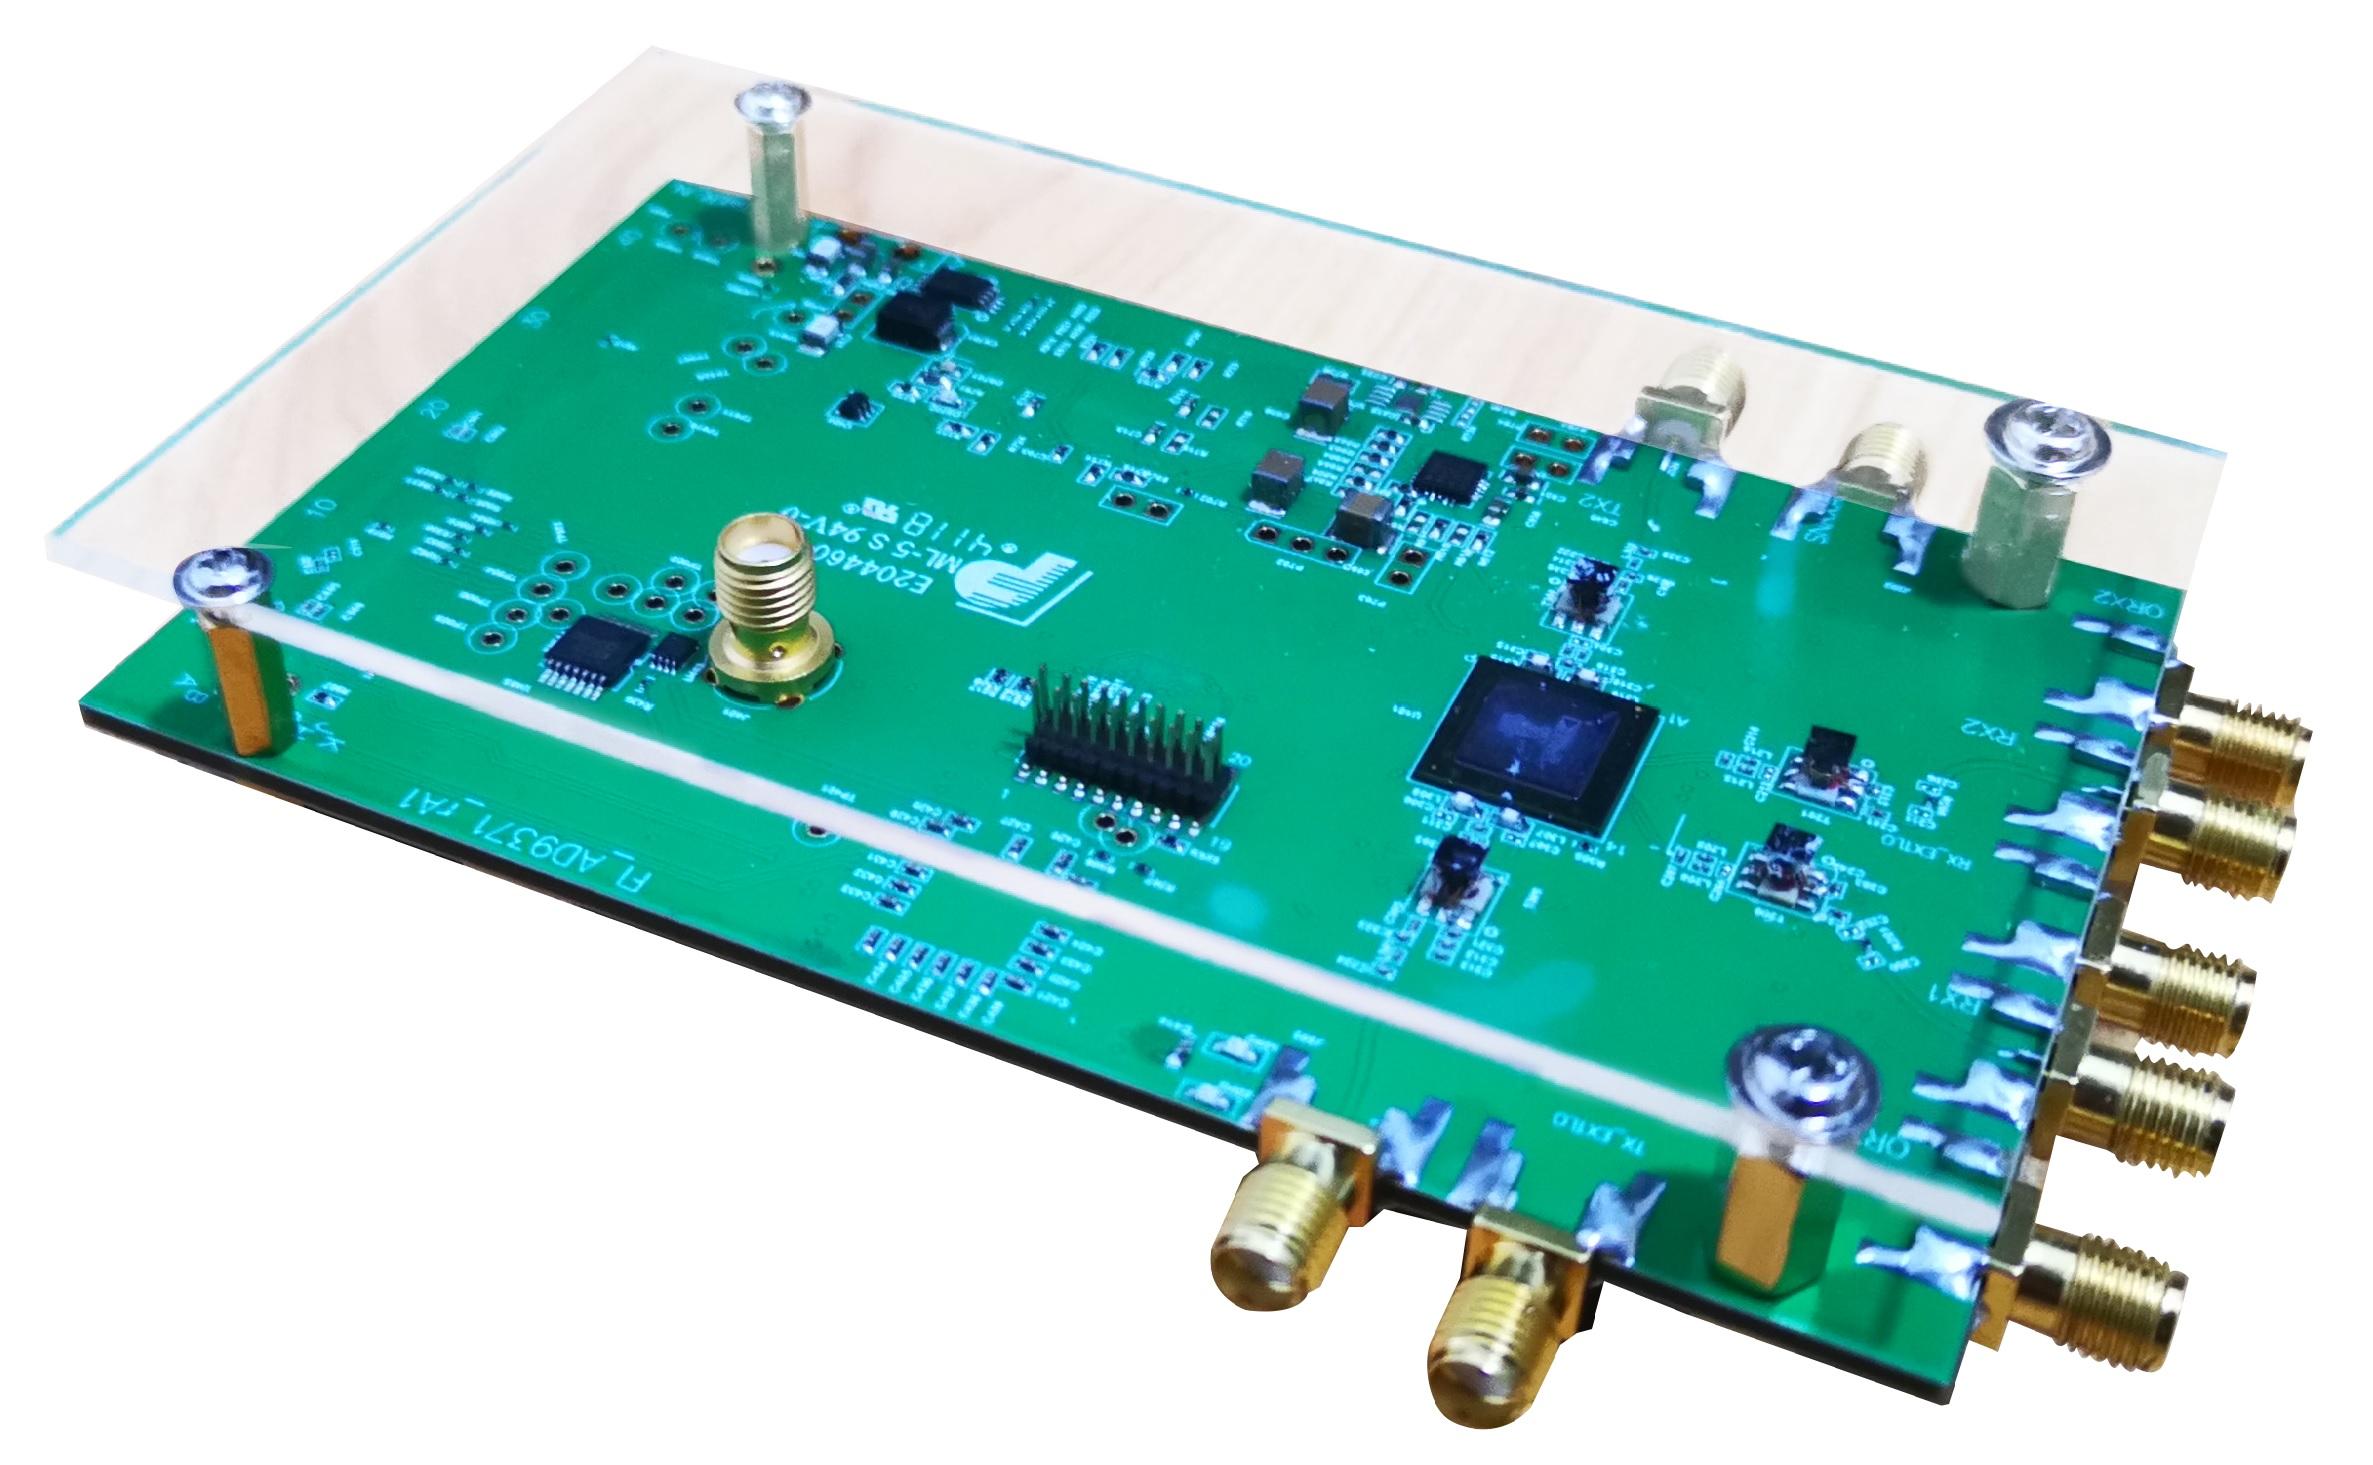 ADRV9371-W/PCBZ Boards